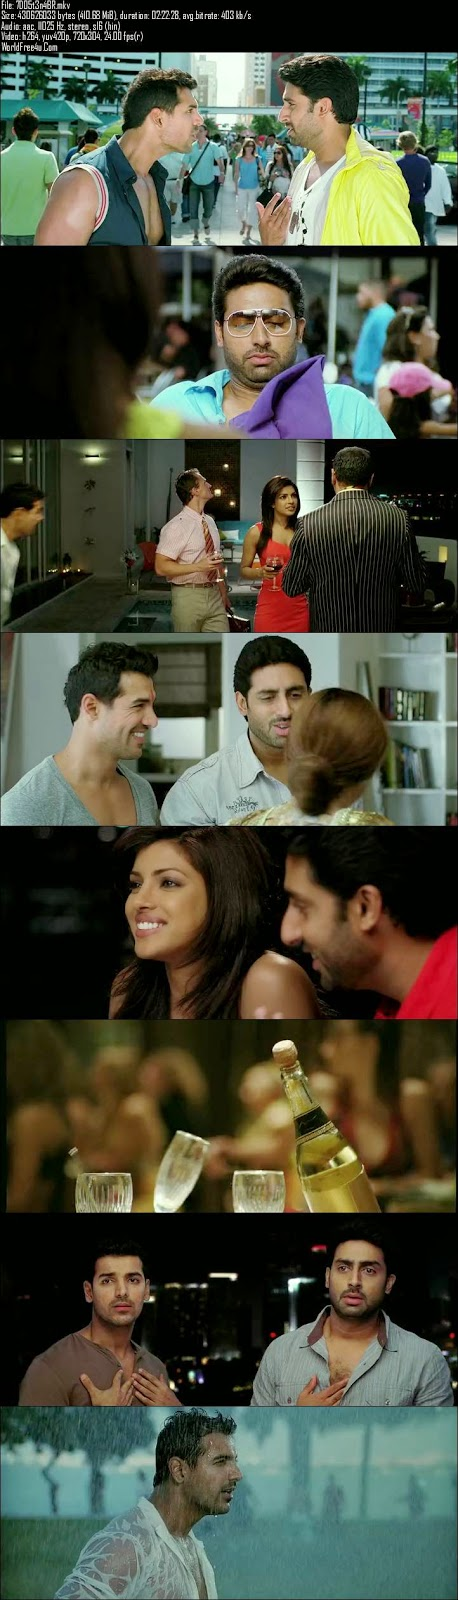 dostana 2008 hindi movie torrent download